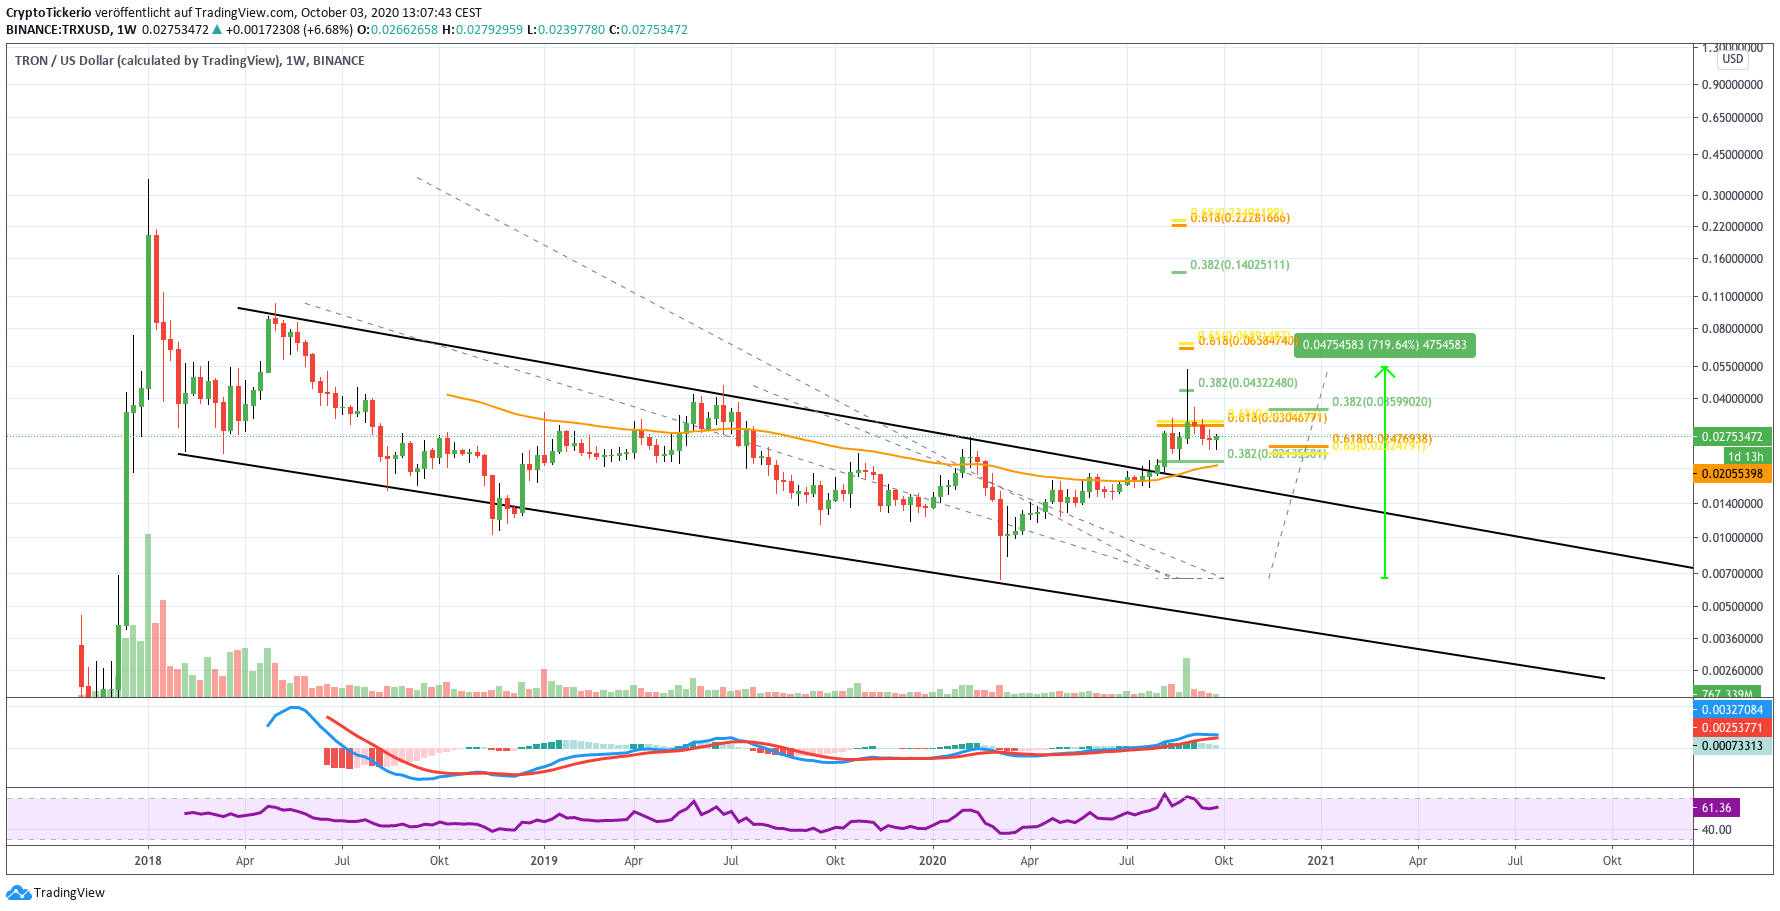 TRX/USD weekly price chart analysis